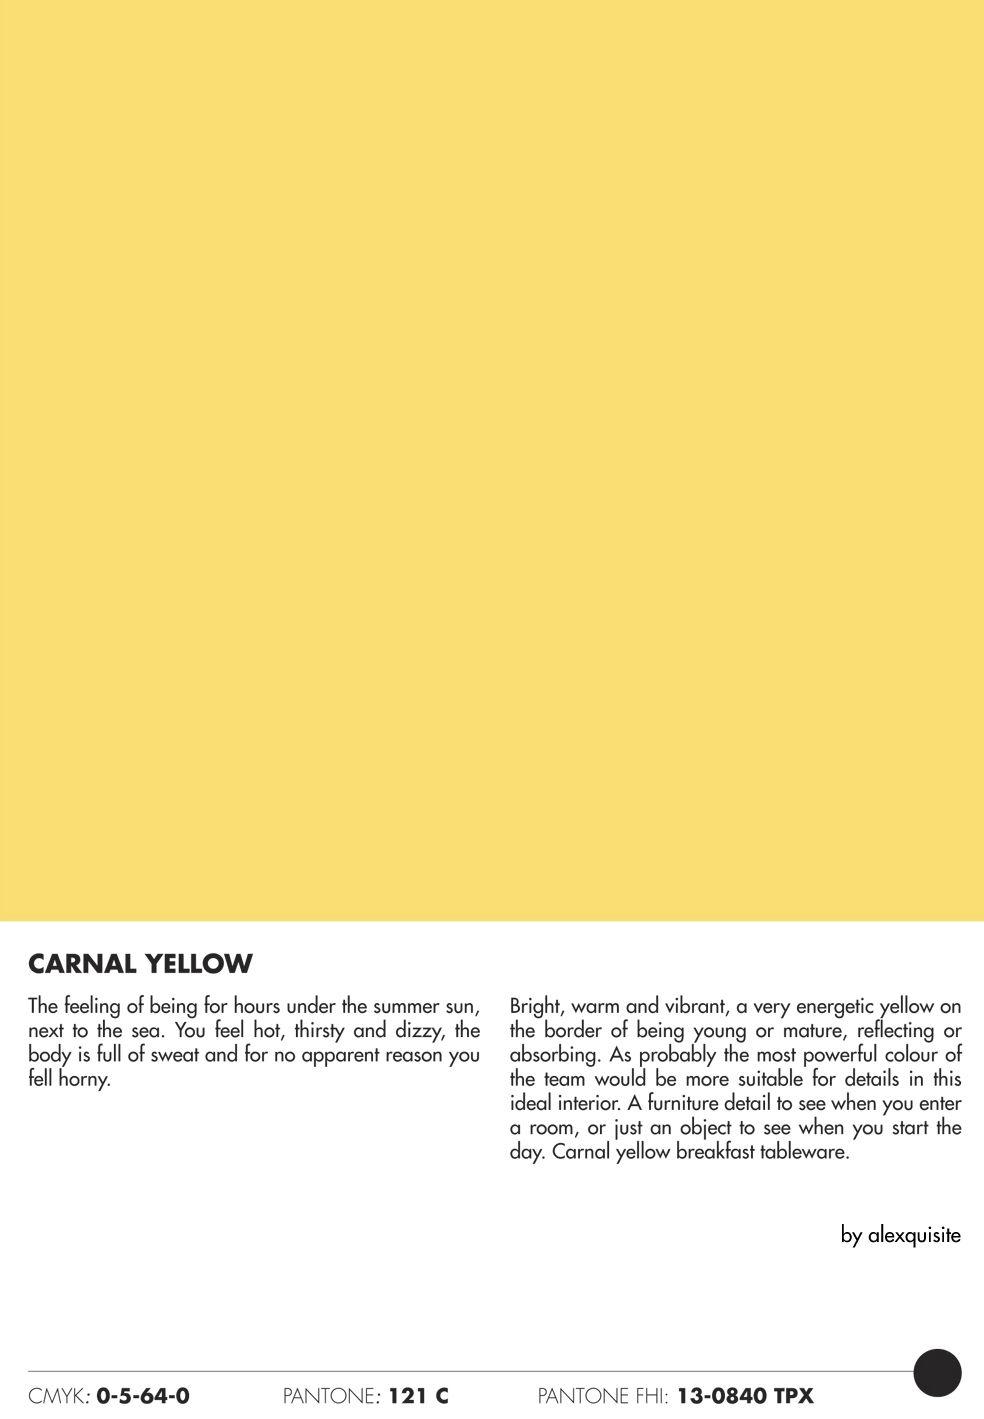 a colour research by alexquisite groovy pinterest aesthetics